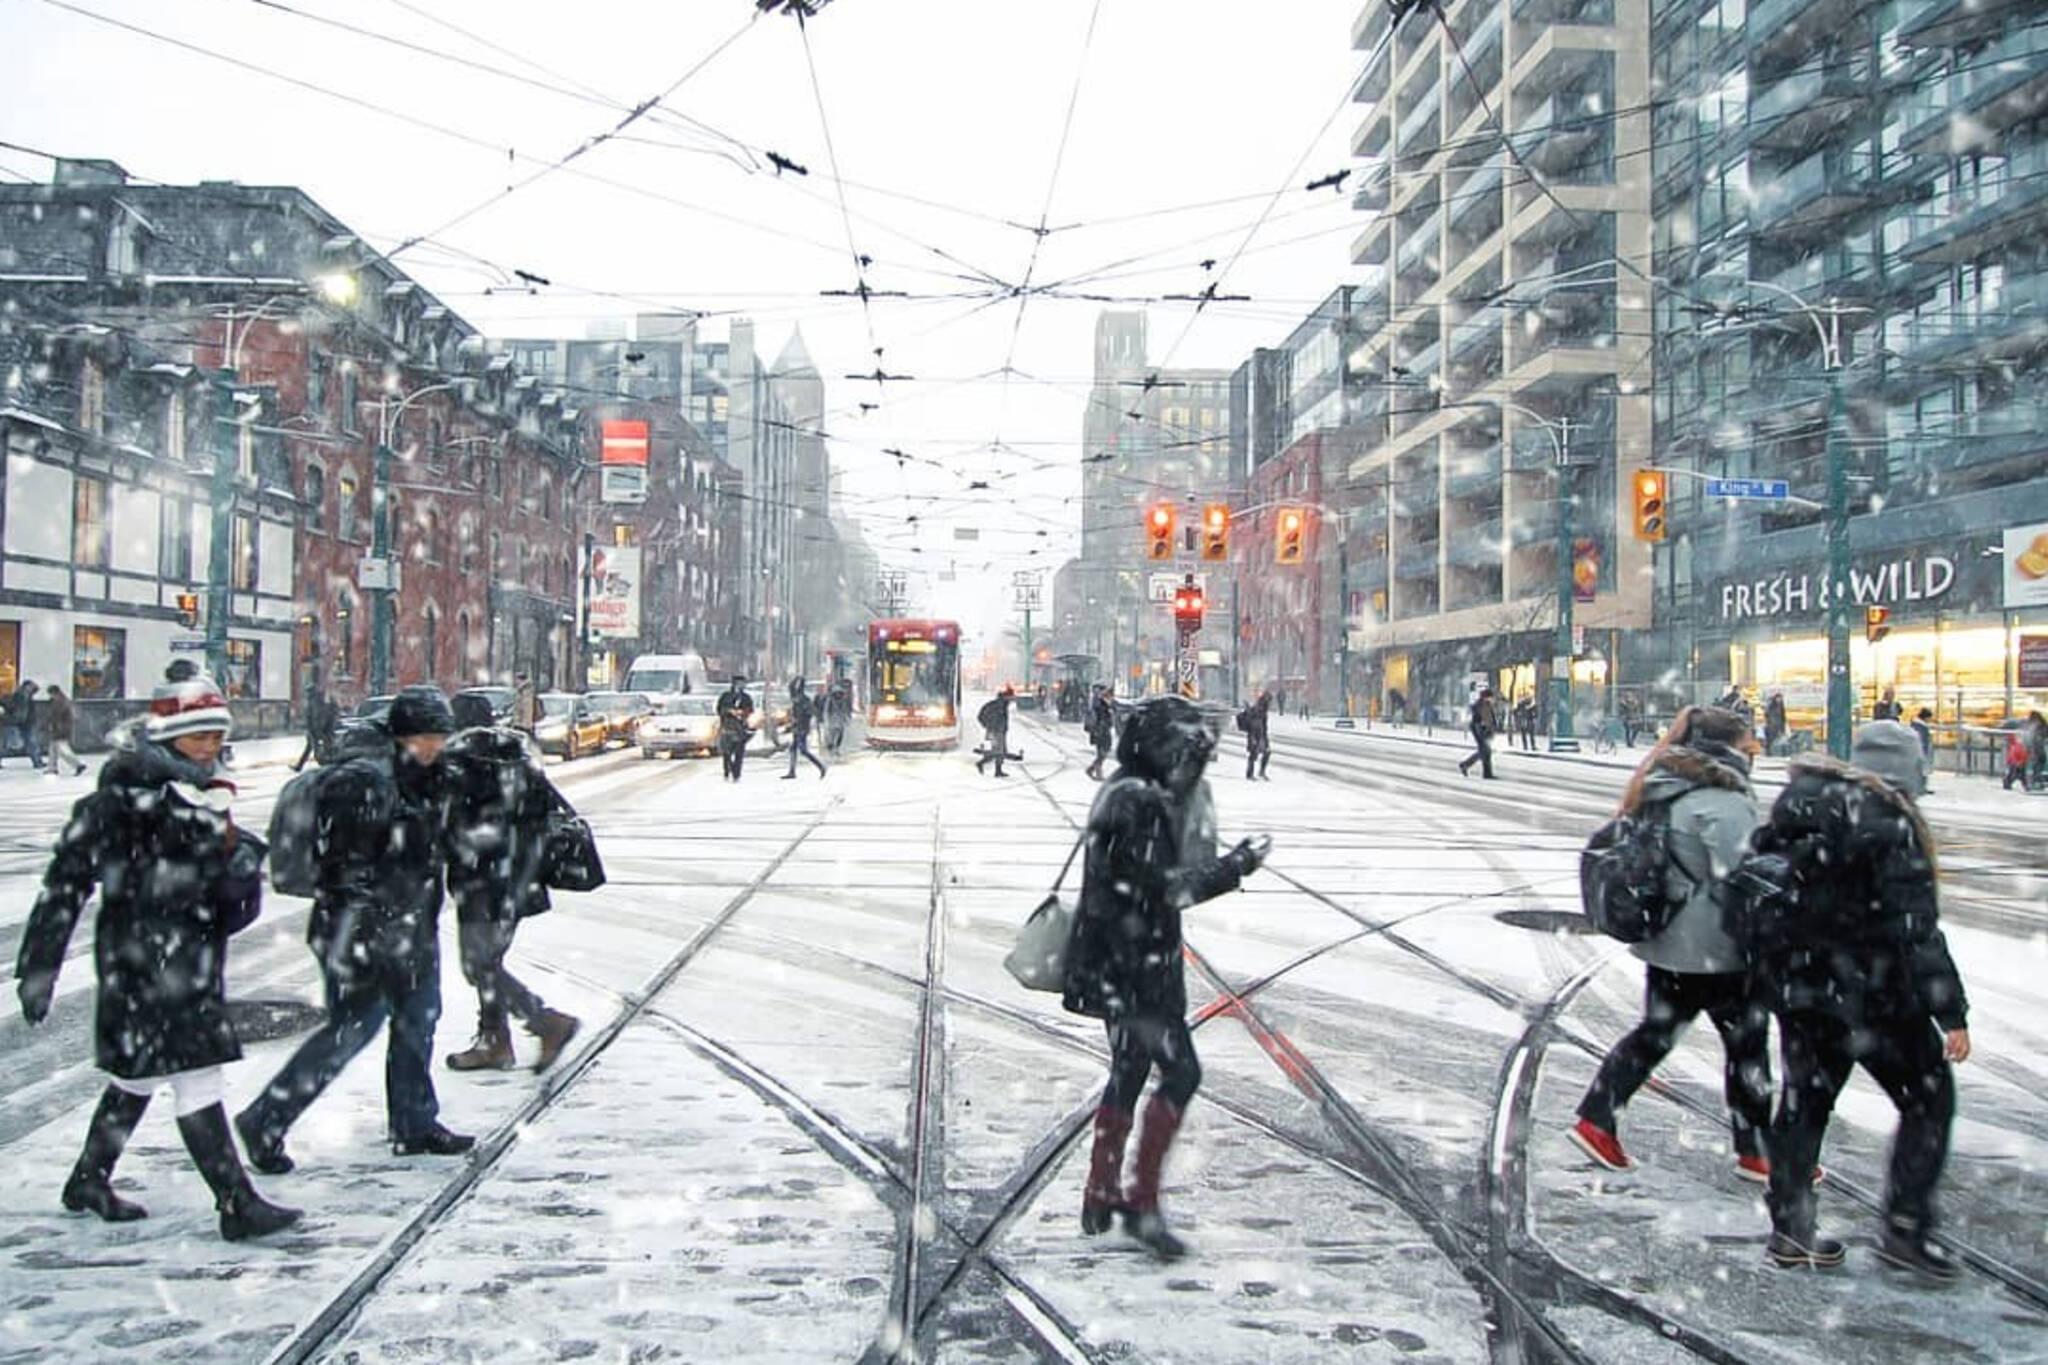 Toronto winter weather